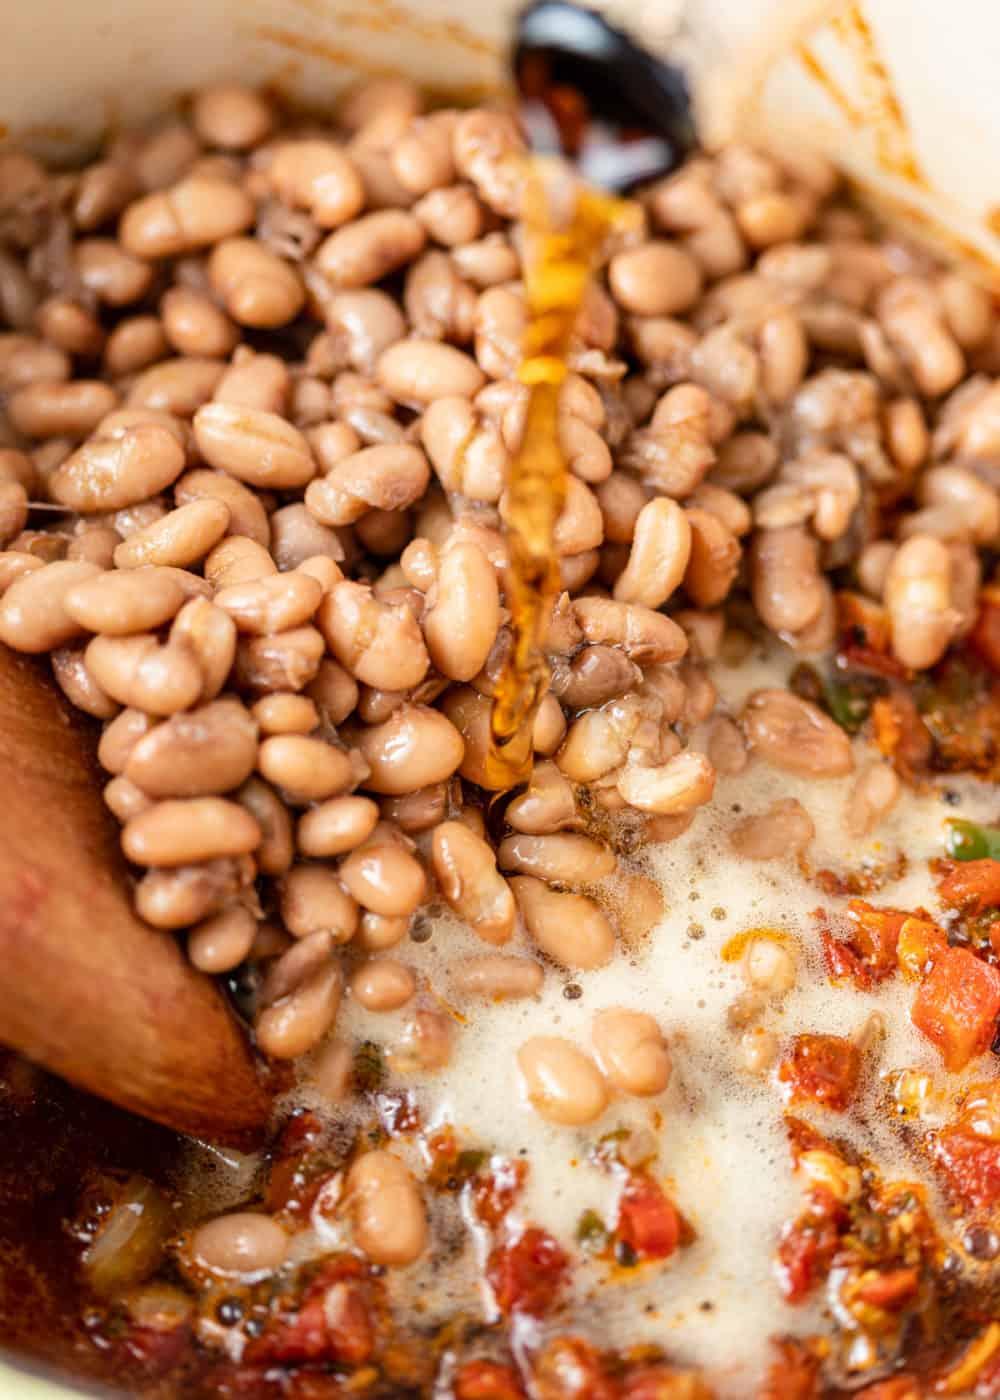 pouring beer into pot to make borracho beans